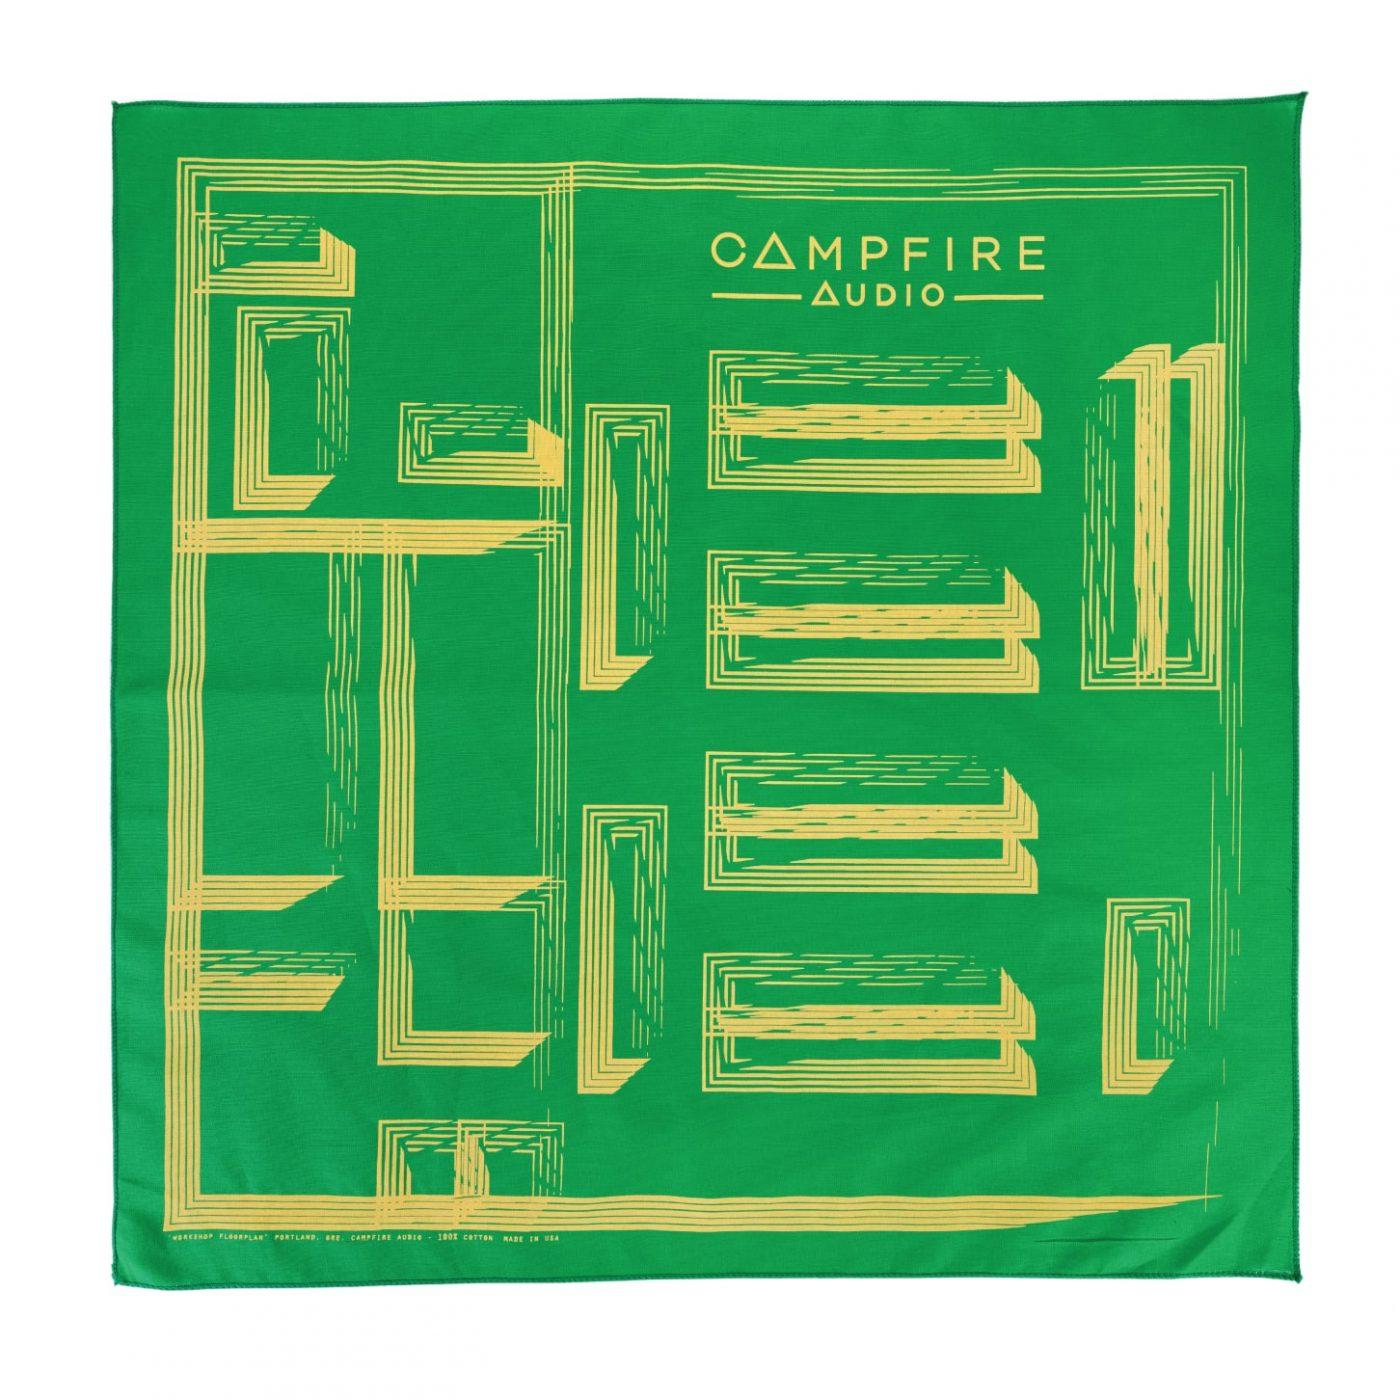 campfire audio workshop floorplan bandana green